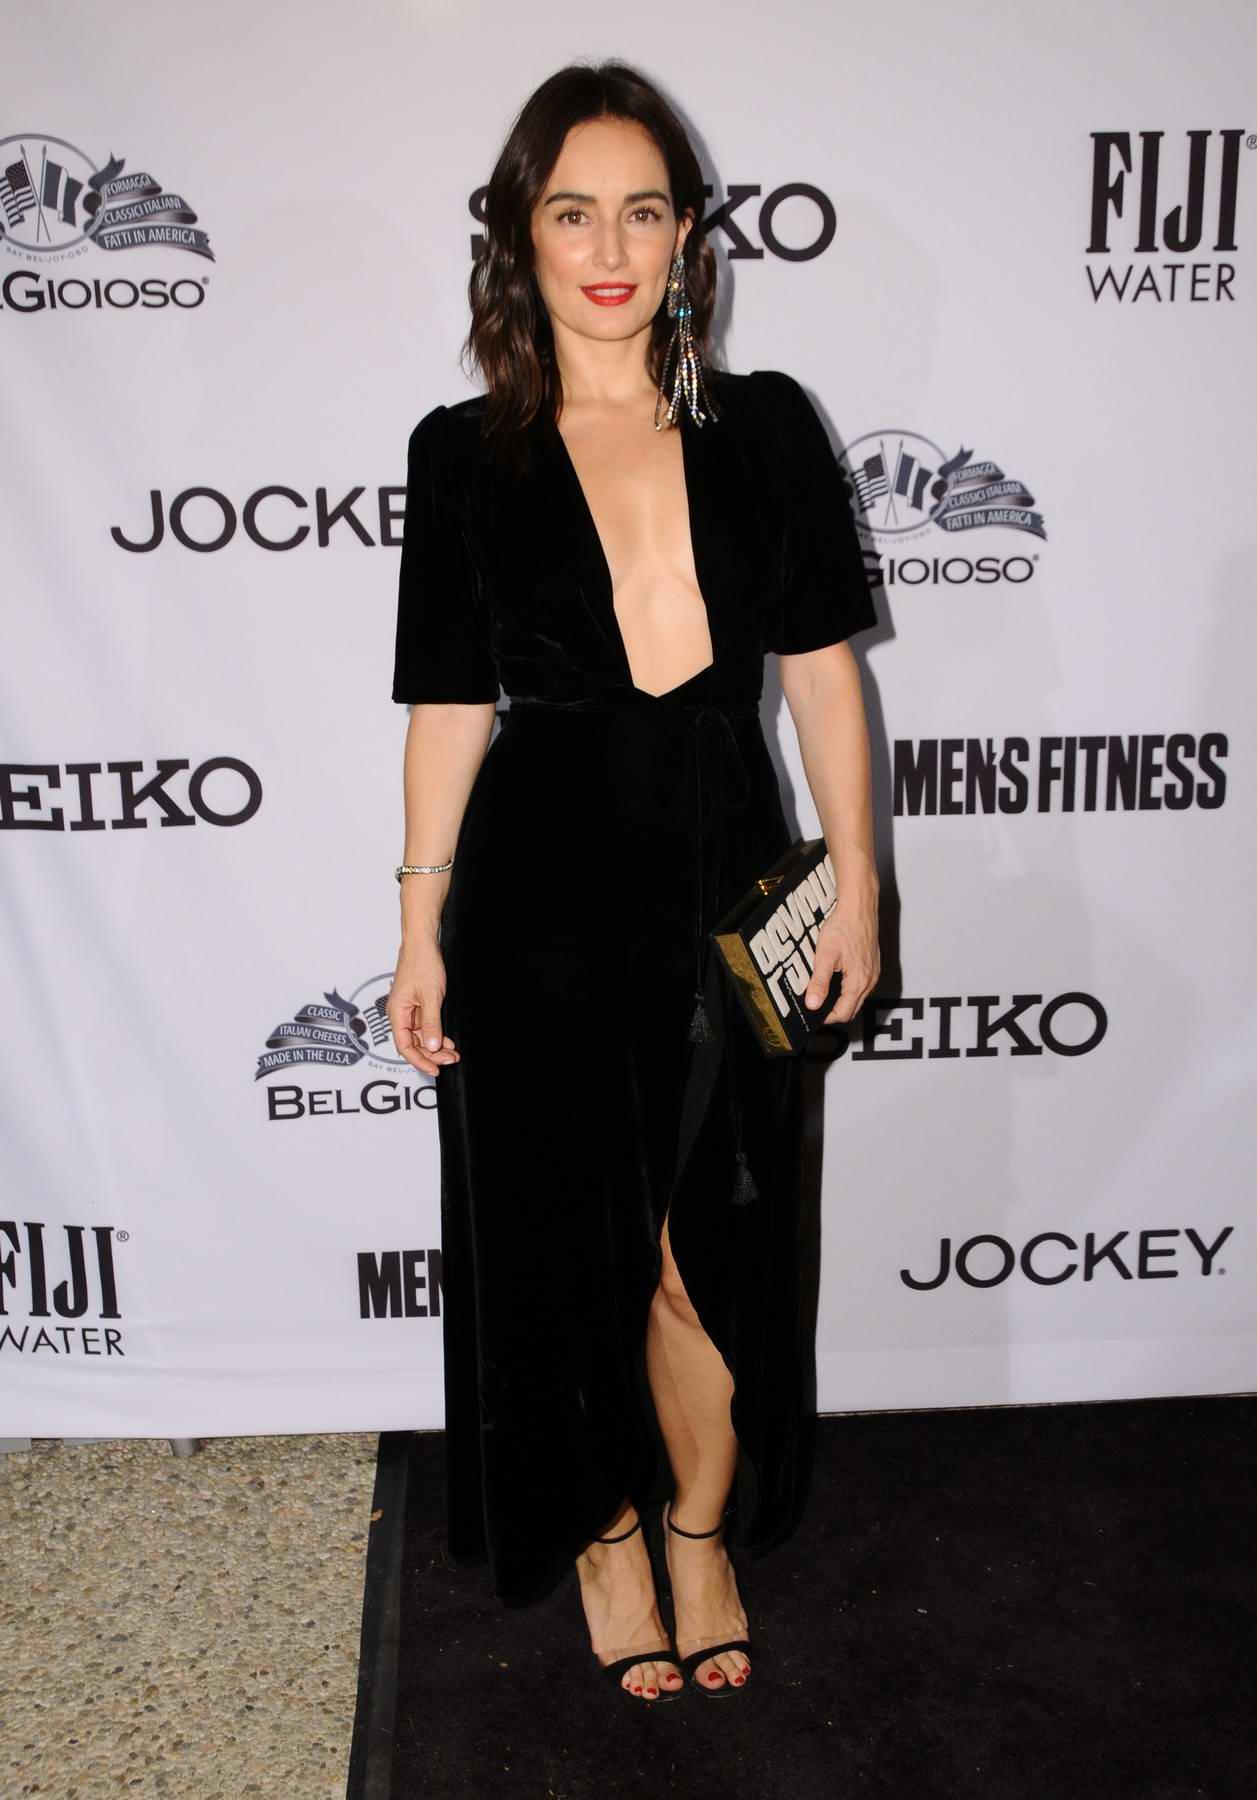 Ana de la Reguera at Men's Fitness Game Changers in Beverly Hills, Los Angeles